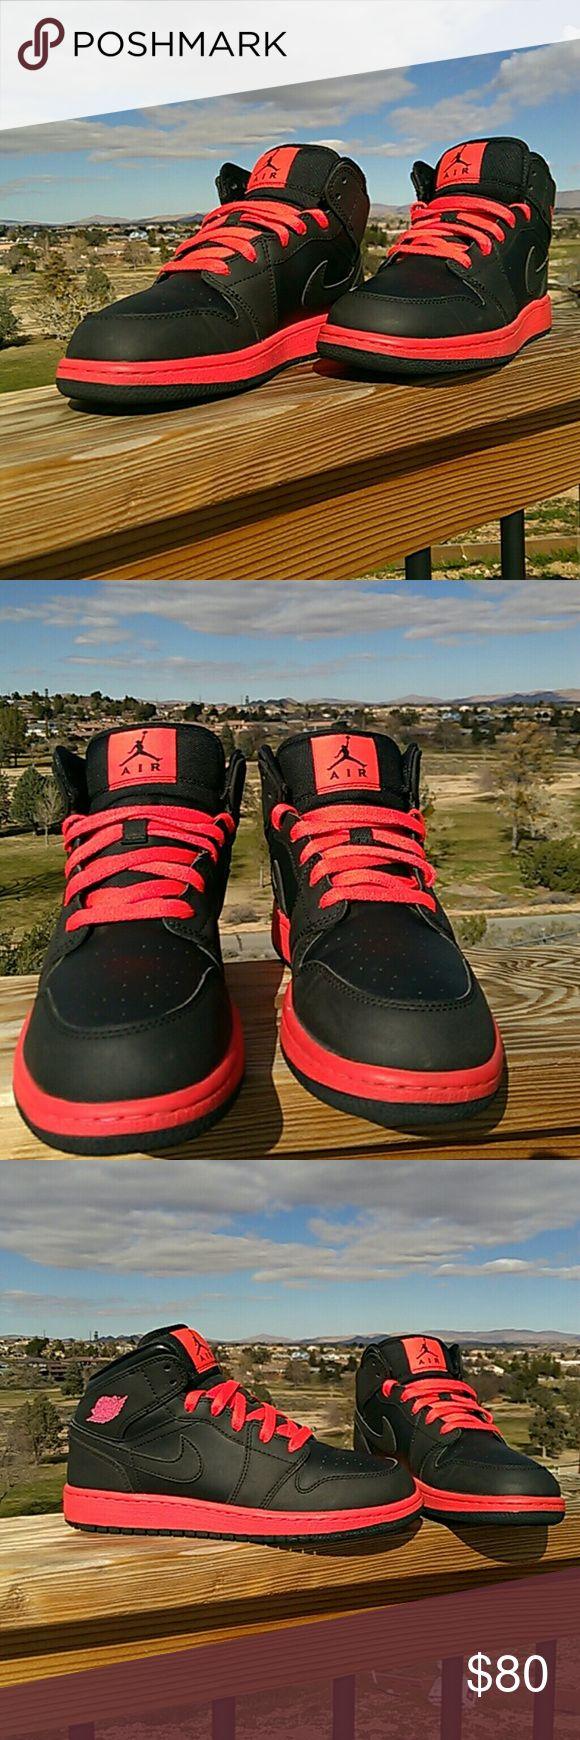 Nike air Jordan #1 Nike air Jordan amaizing condition Nike Shoes